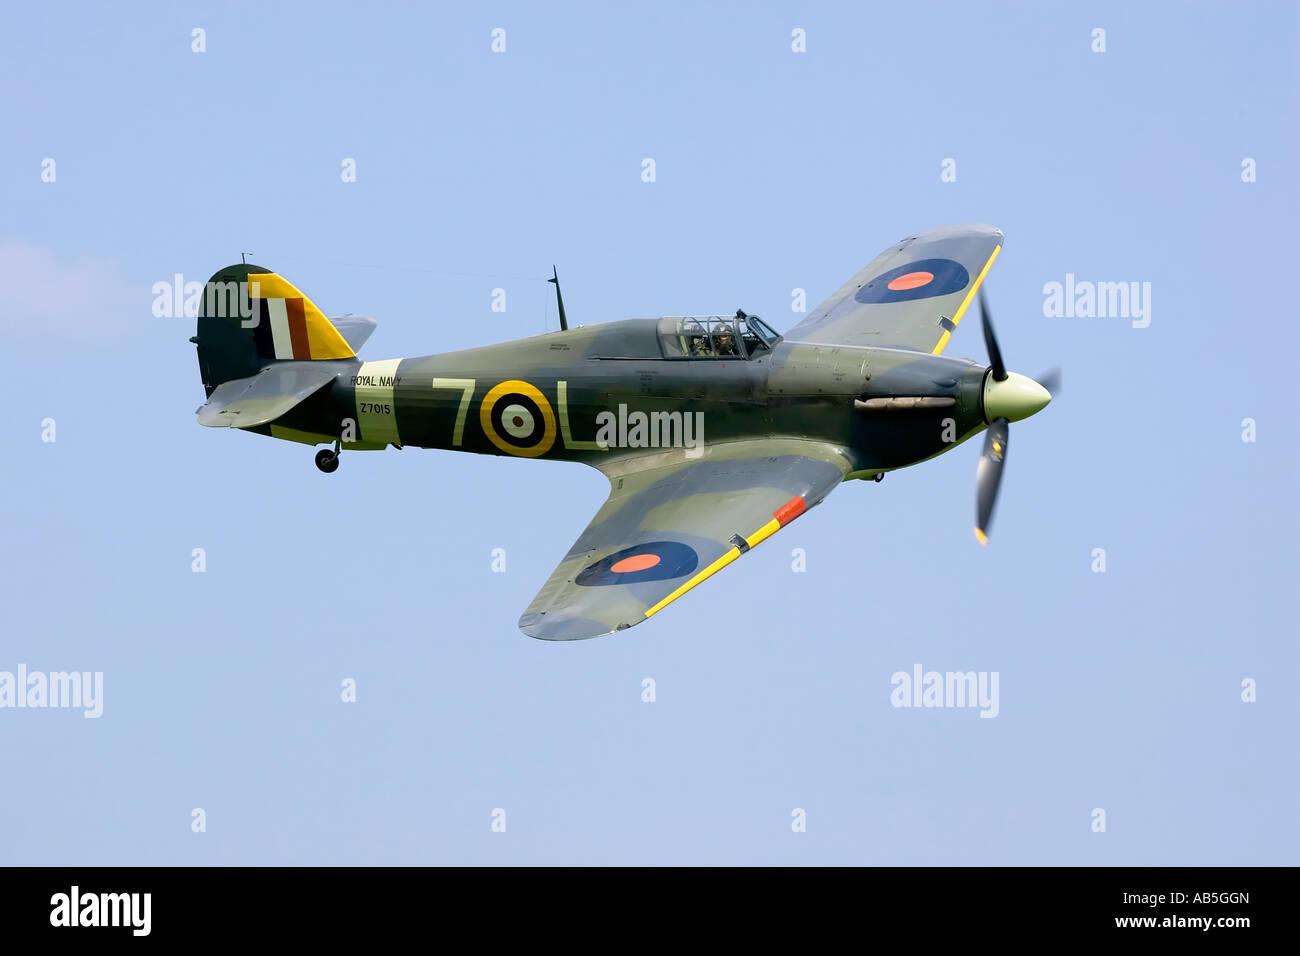 A veteran Hawker Sea Hurricane of the Royal Navy - Stock Image